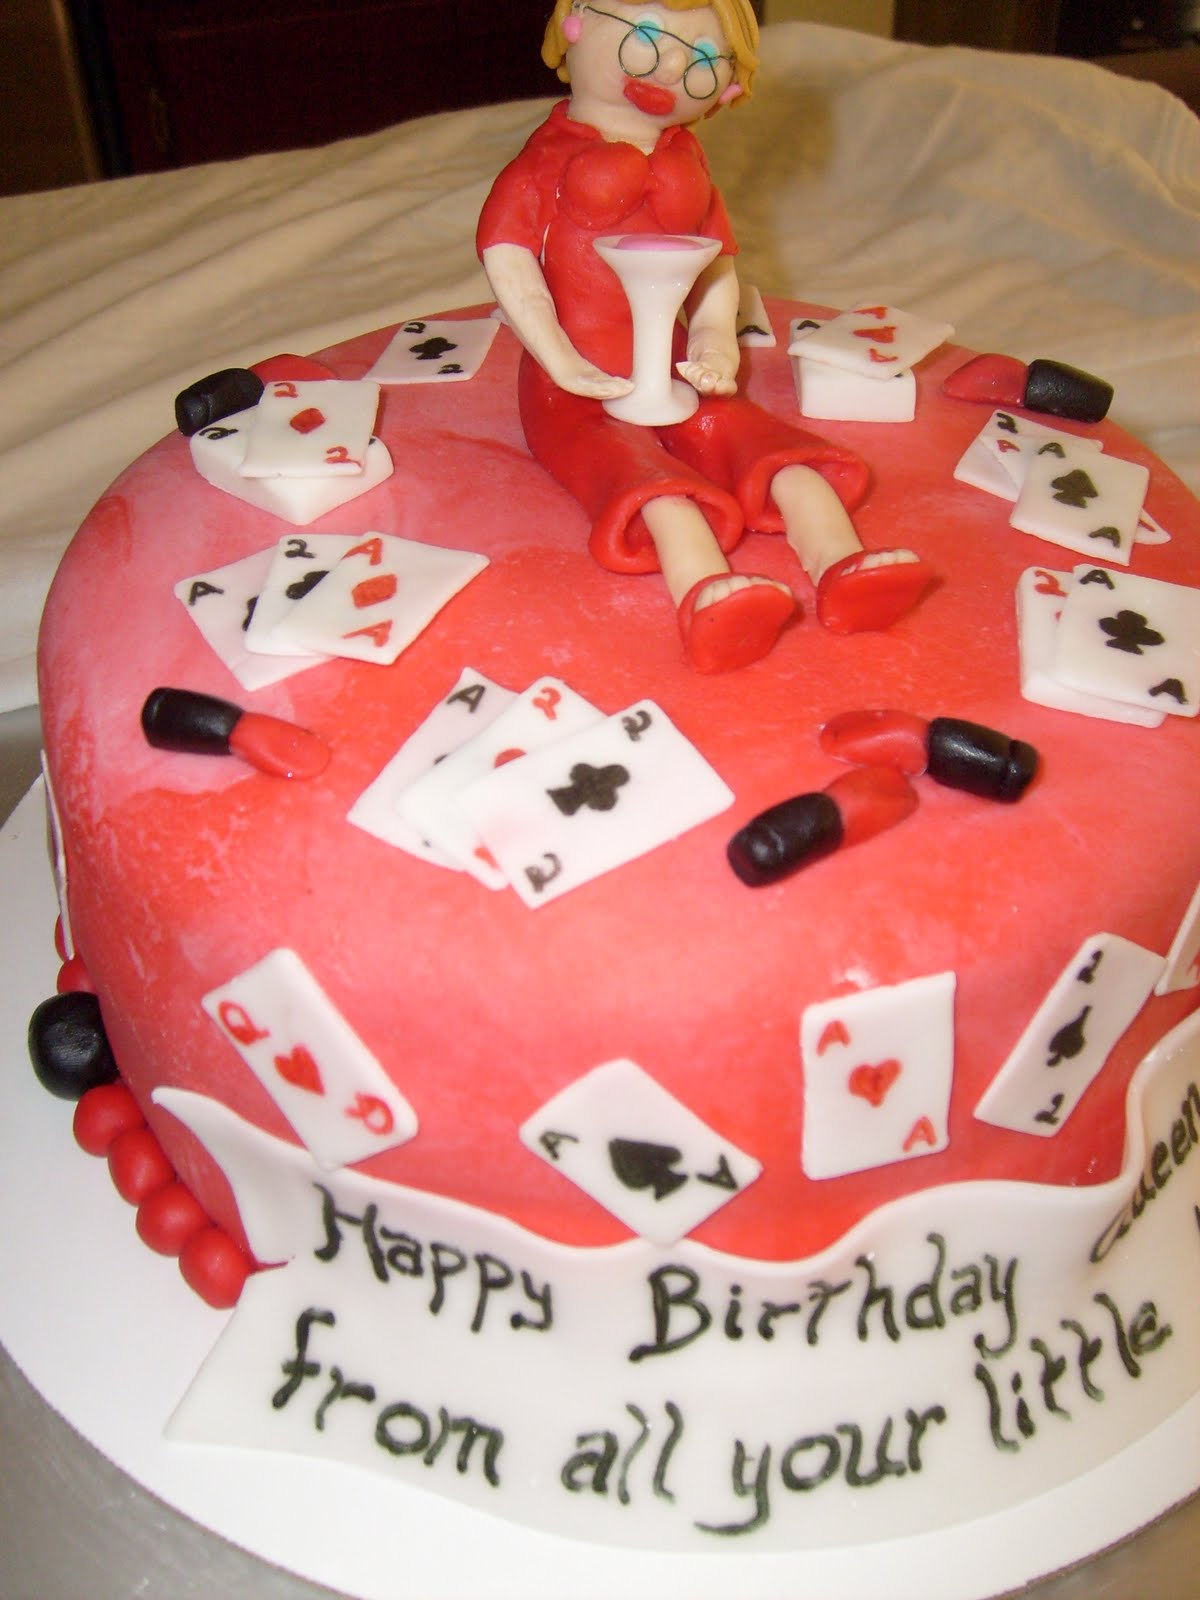 Cake Decoration Playing Cards : Cake Decorating: playing cards